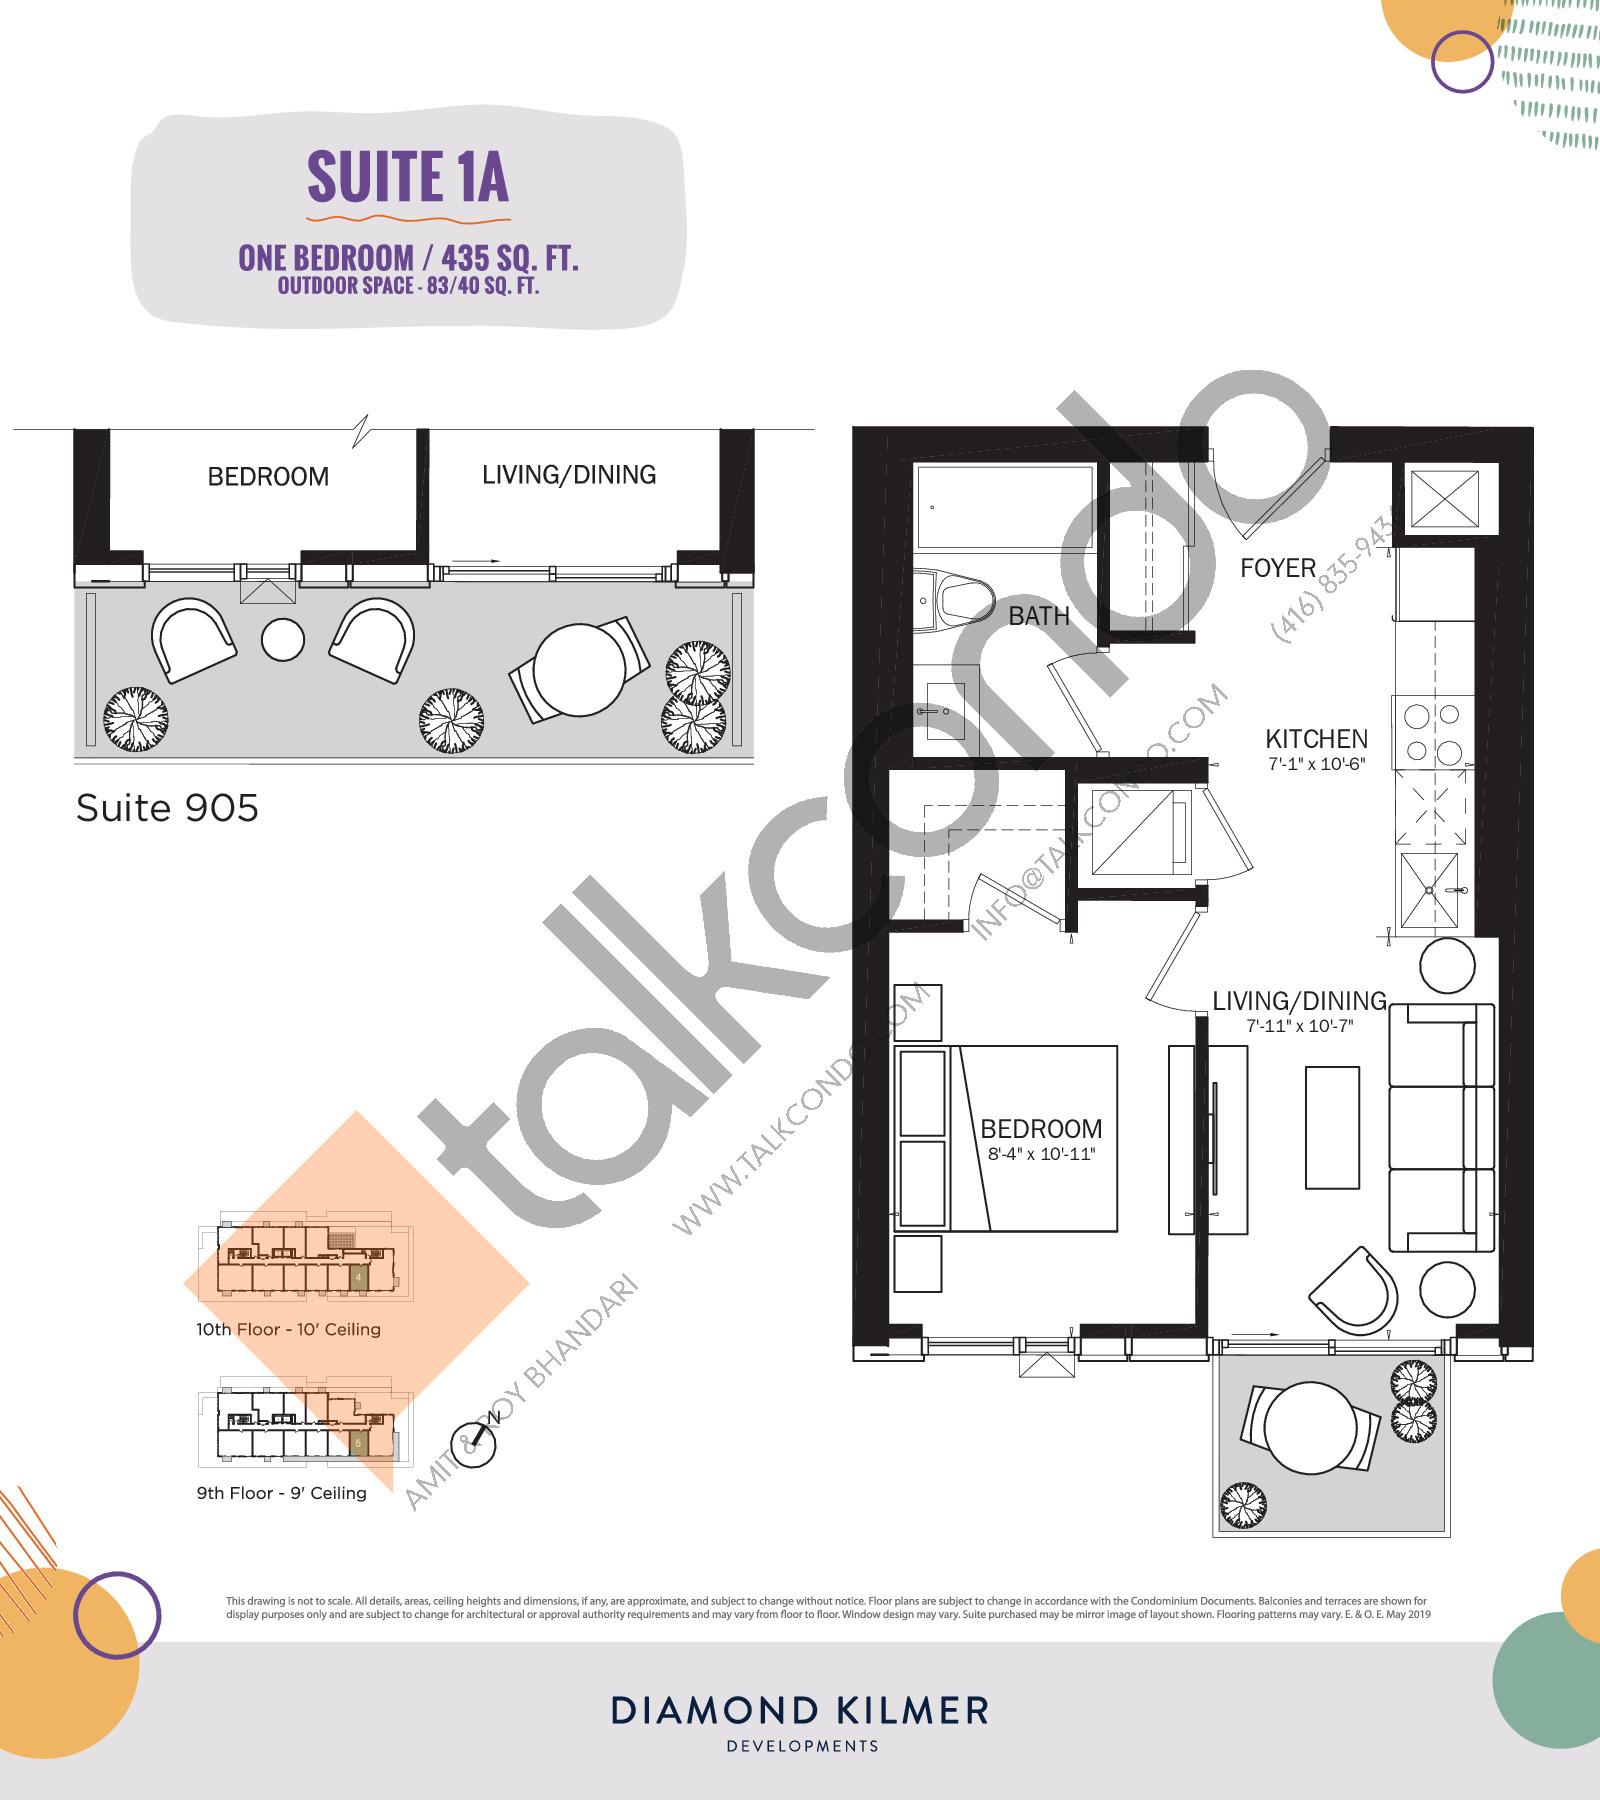 1A Floor Plan at Reunion Crossing Condos & Urban Towns - 435 sq.ft